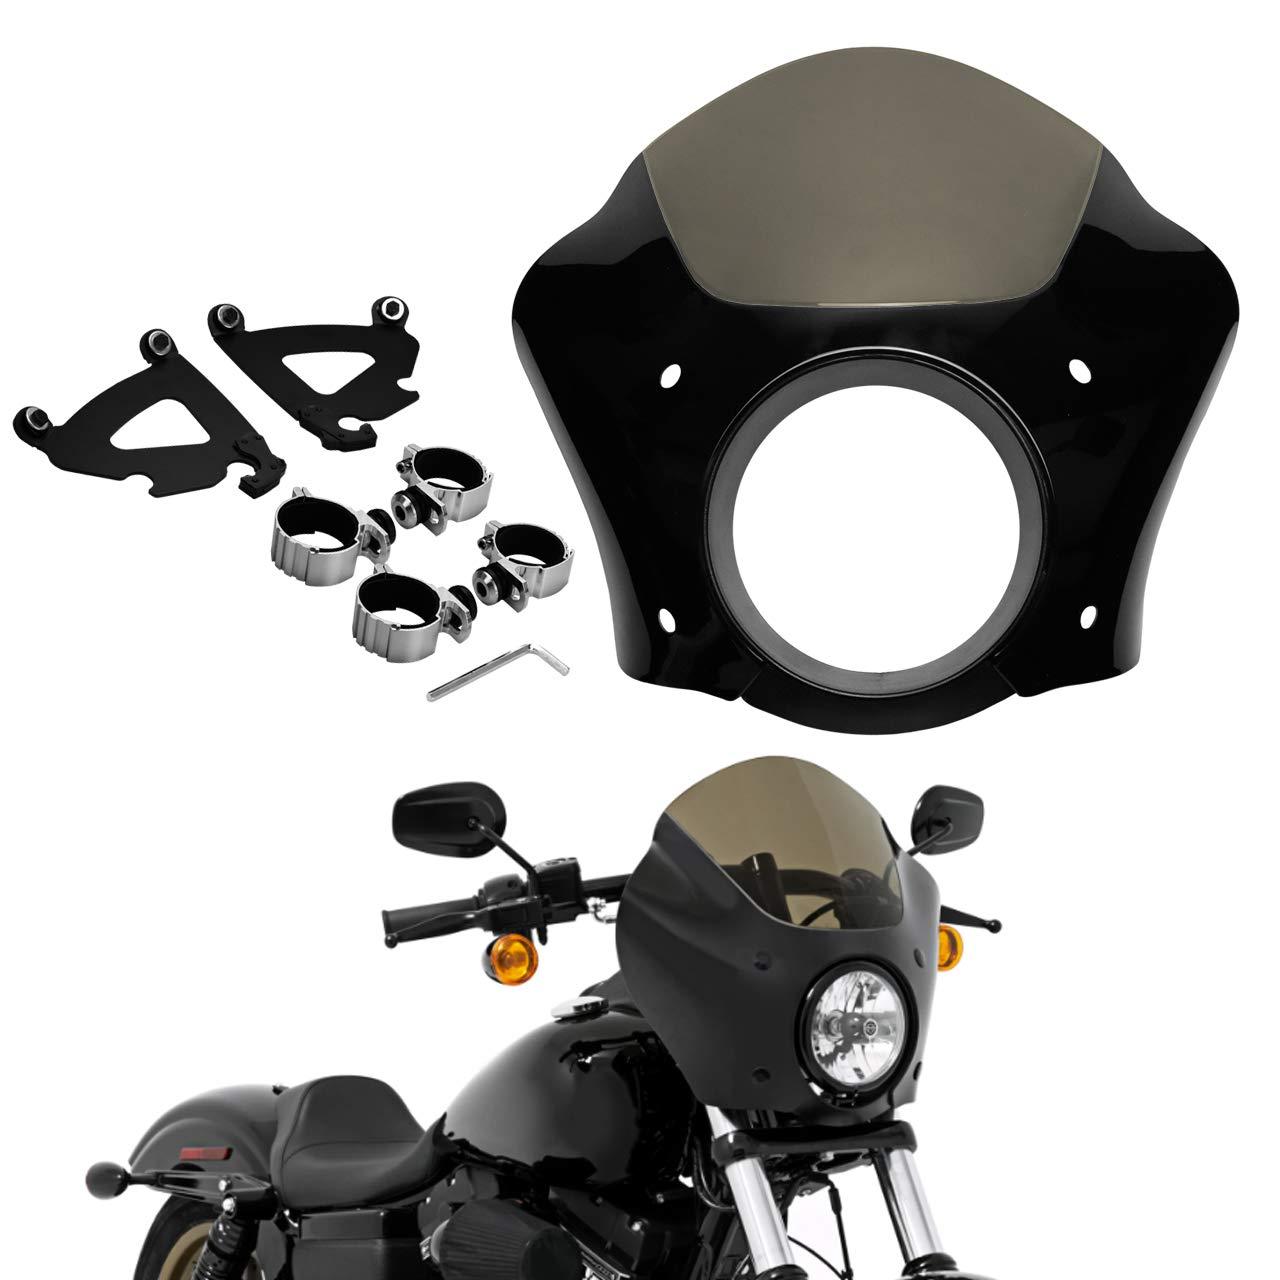 HDBUBALUS Headlight Gauntlet Fairing 49mm Trigger Mount for Harley Dyna Low Rider Street Bob